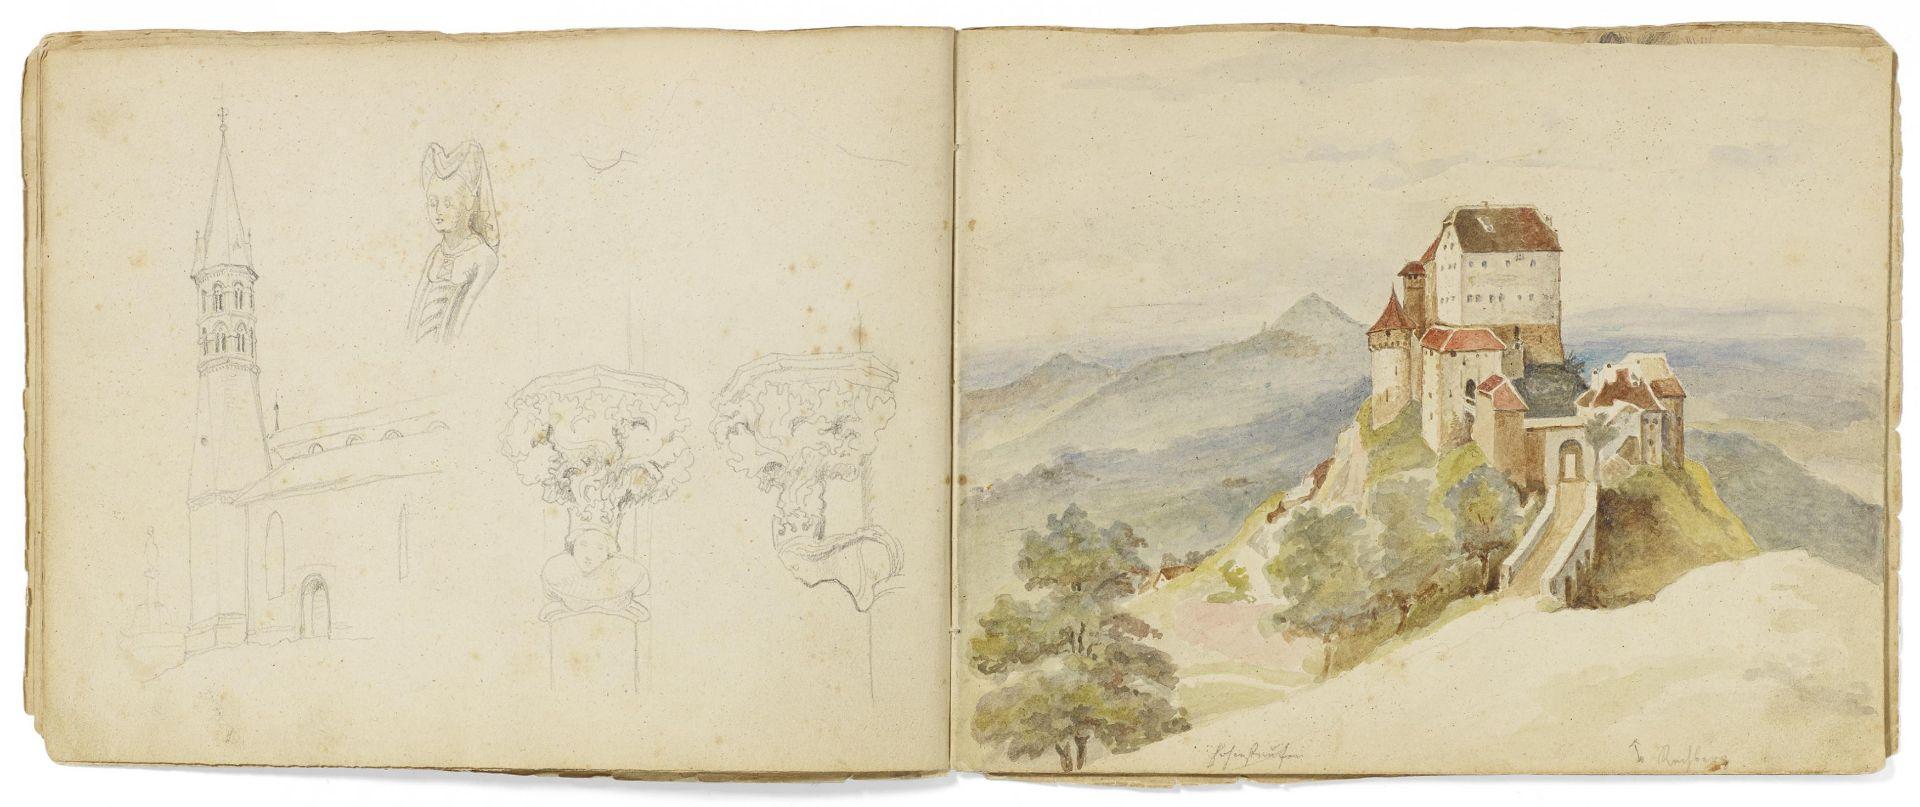 Kaupert, Gustav Kassel 1819 - 1897  Sketchbook, two booklets, each ca. 17 pages. Architectural - Bild 5 aus 8